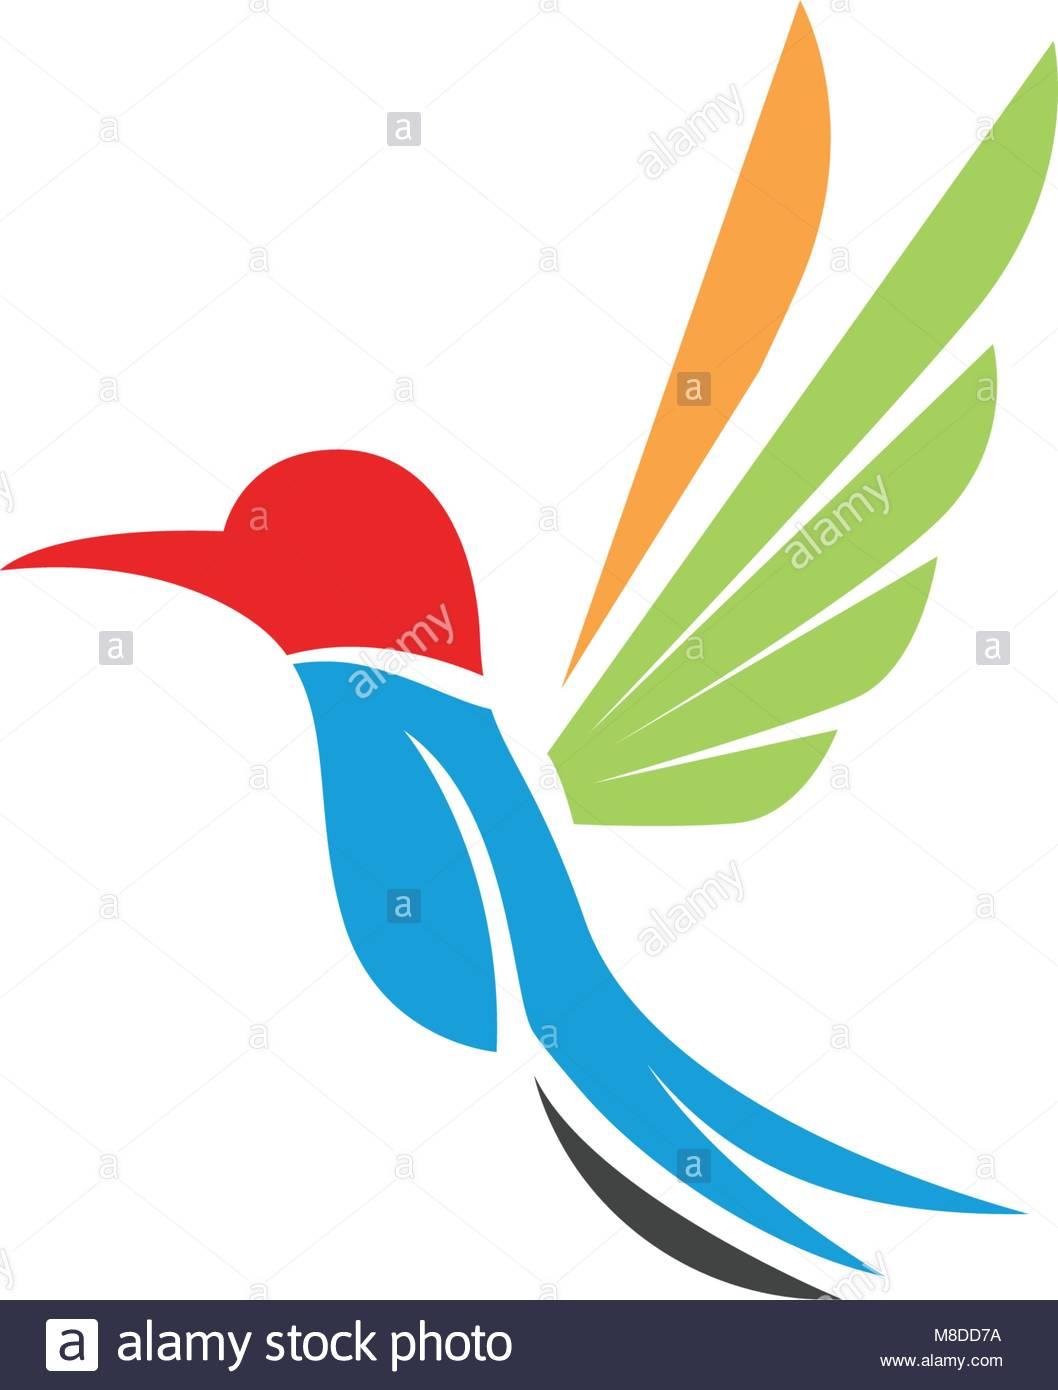 Simplistic vector vectors stock photos simplistic vector vectors hummingbird icon logo and symbols template vector stock image biocorpaavc Images